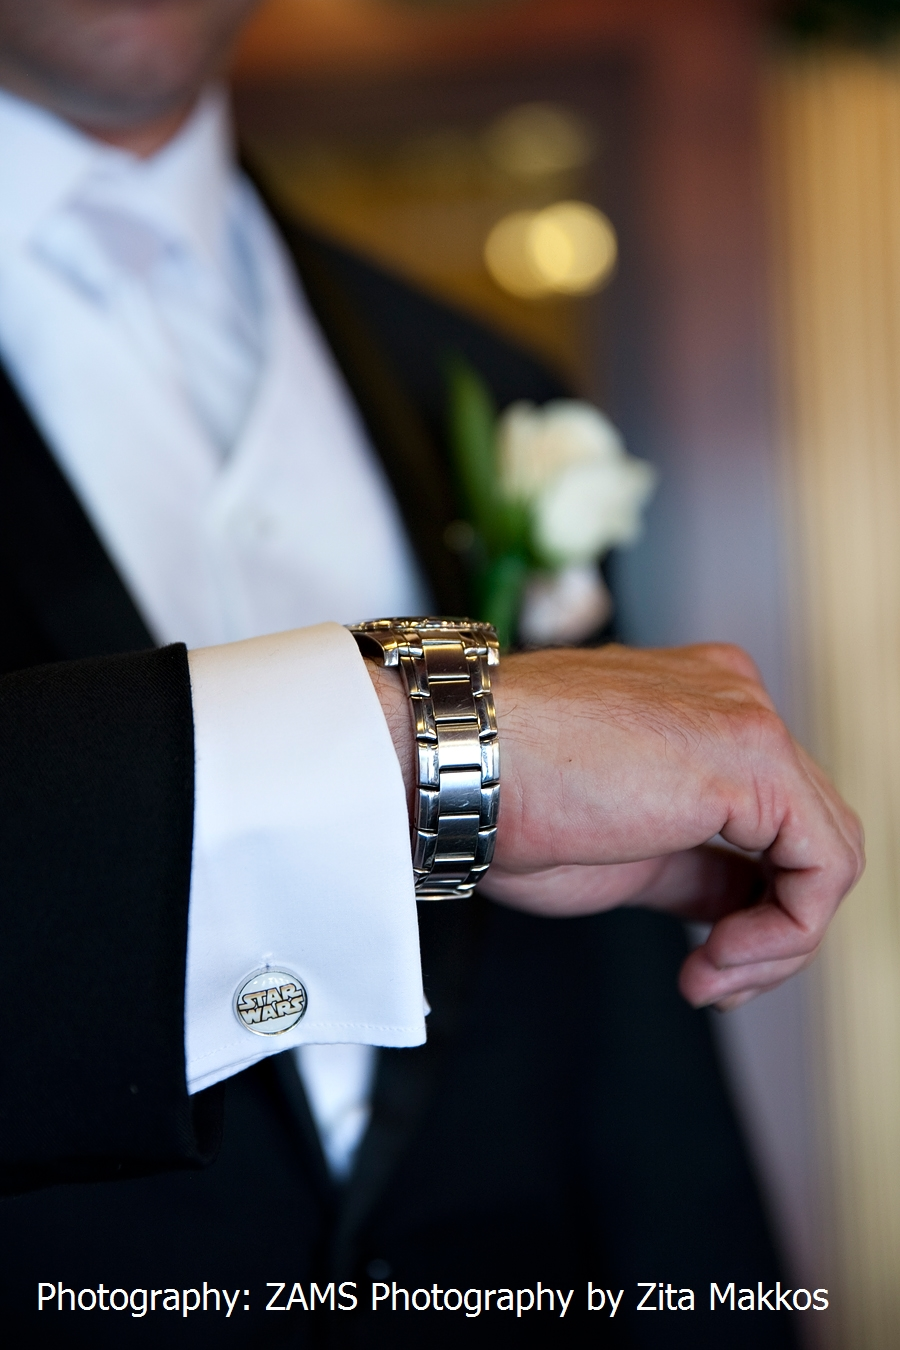 fight_club_in_tyler_we_trust_2_cuff_links_men_wedding_cufflinks_2.jpg